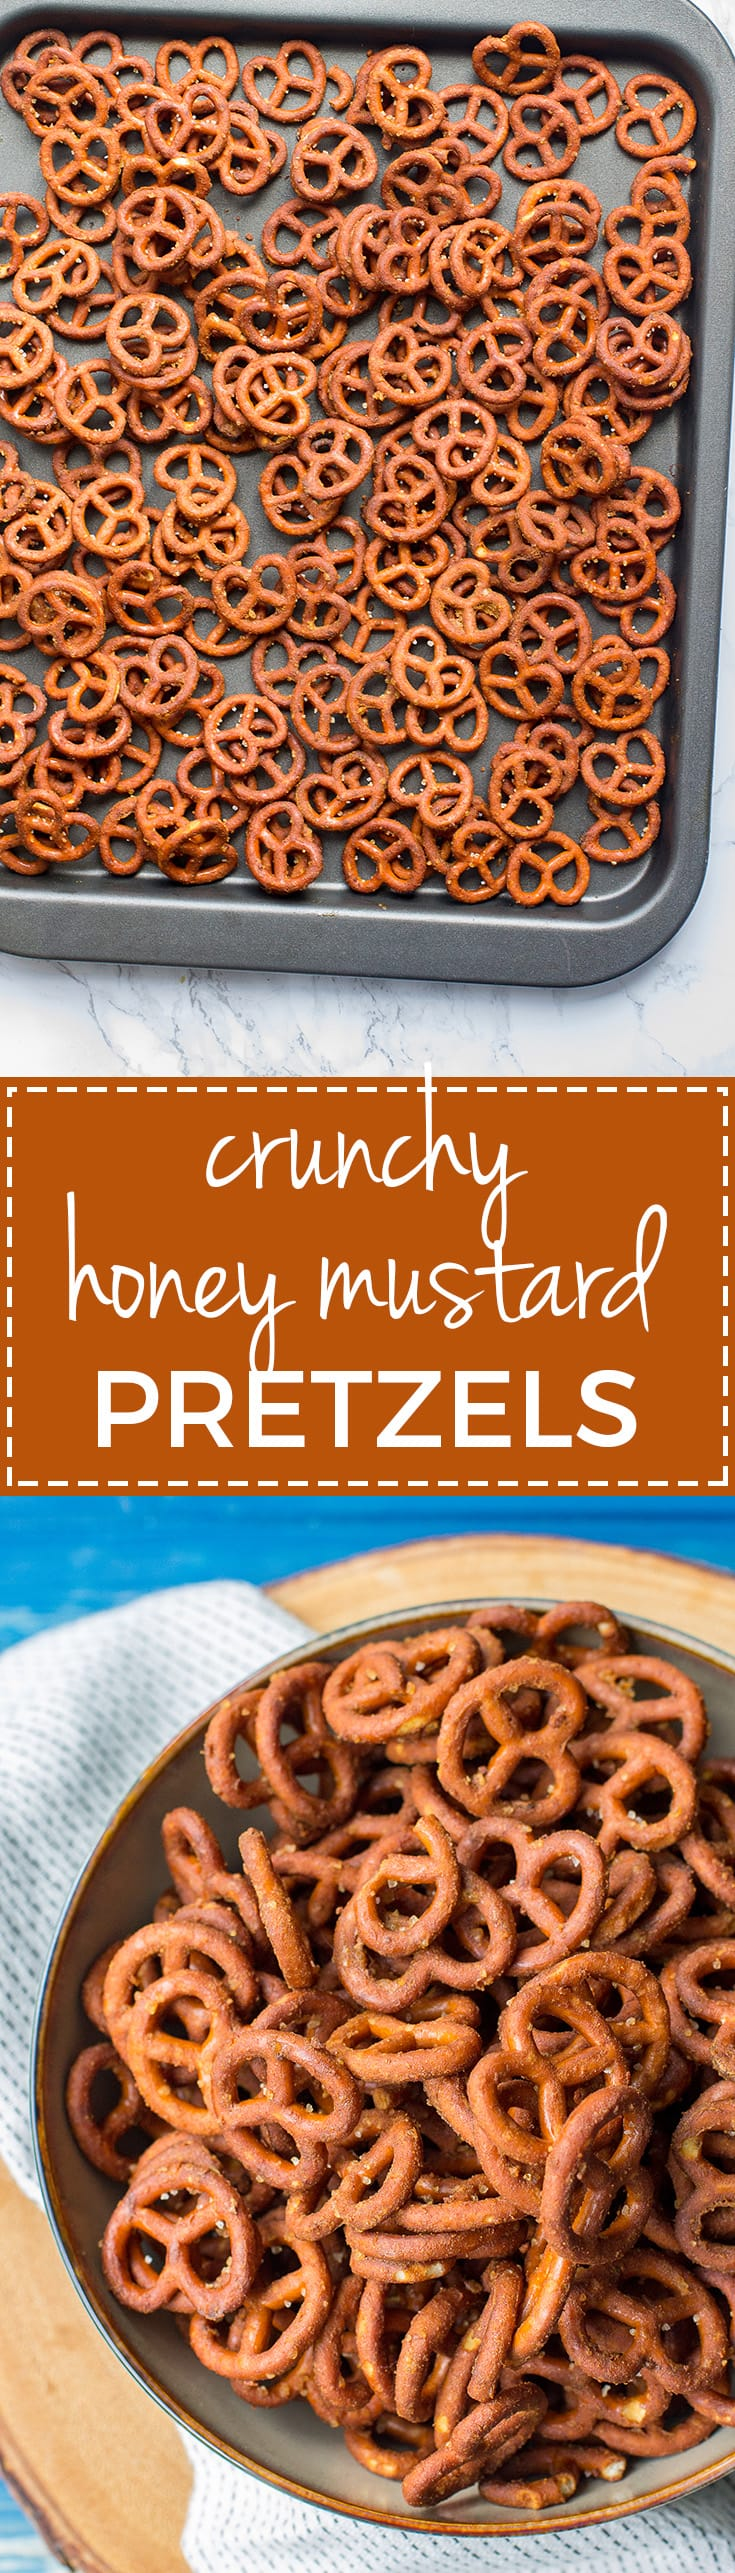 Crunchy honey mustard pretzels   A simple, easy, addictive snack for game day or after school treats. #footballsnacks #seasonedpretzels